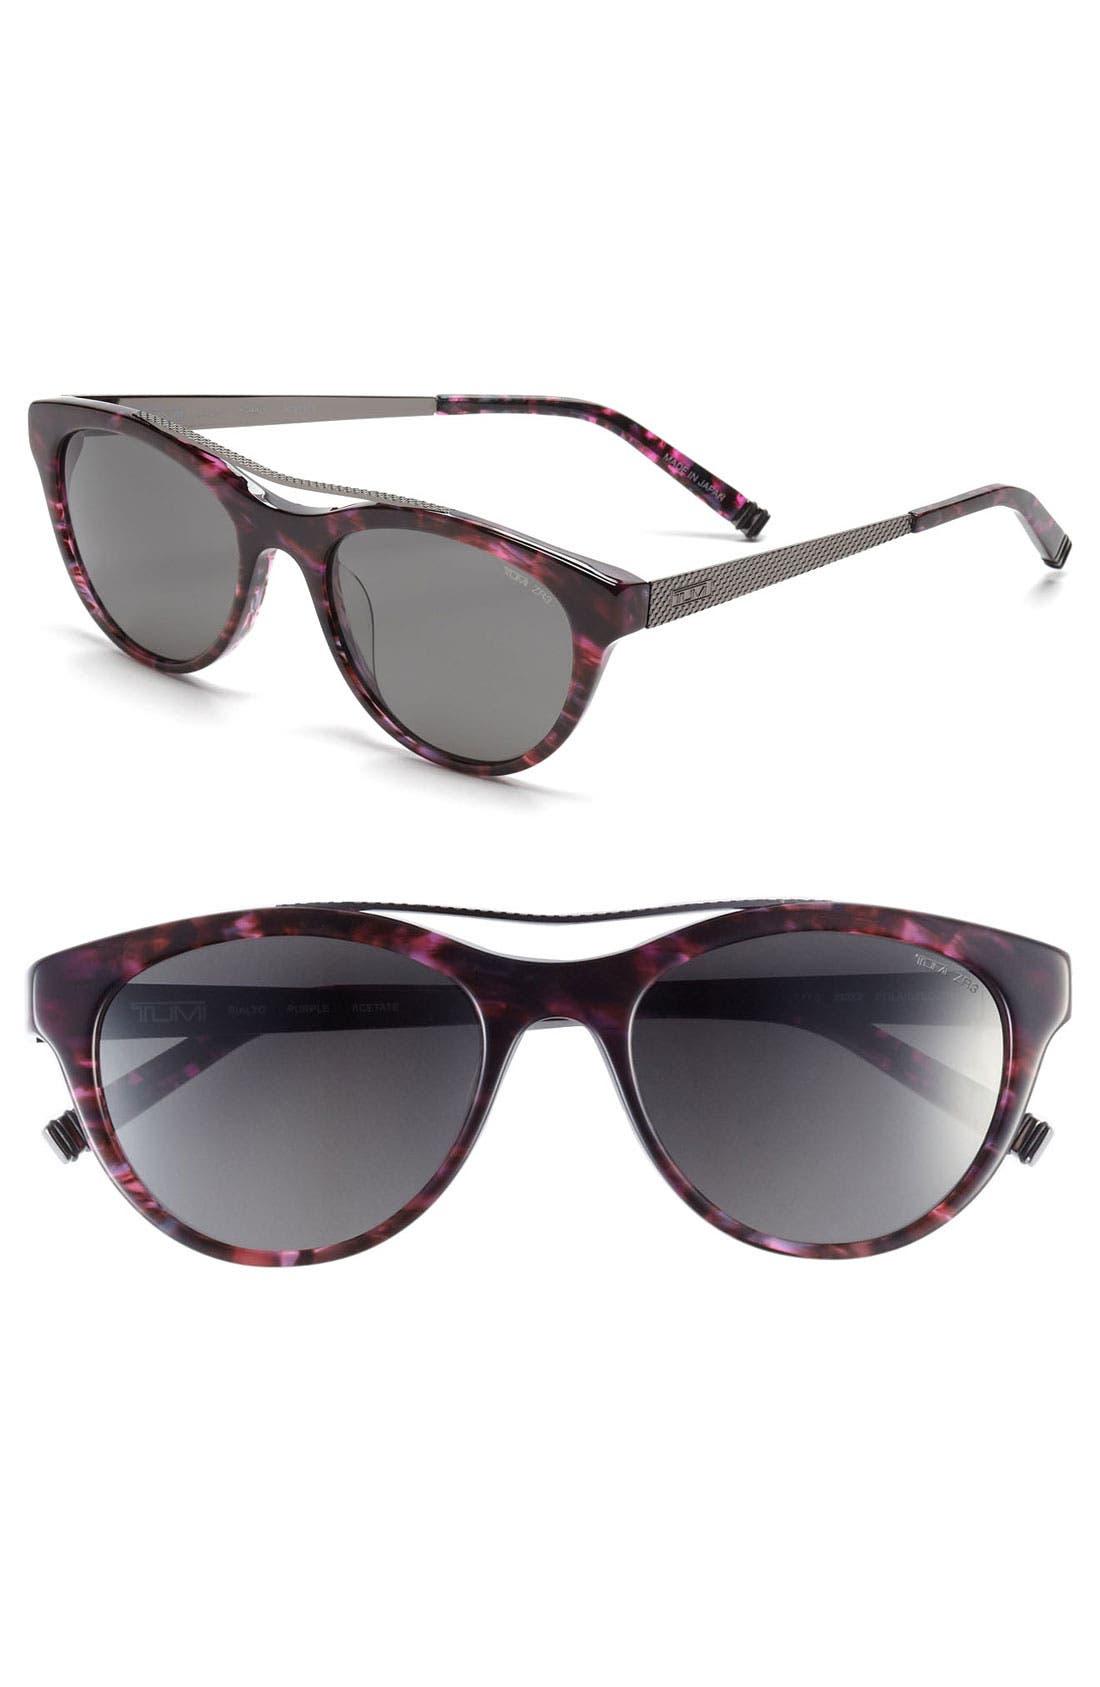 Main Image - Tumi 'Rialto' 51mm Polarized Sunglasses